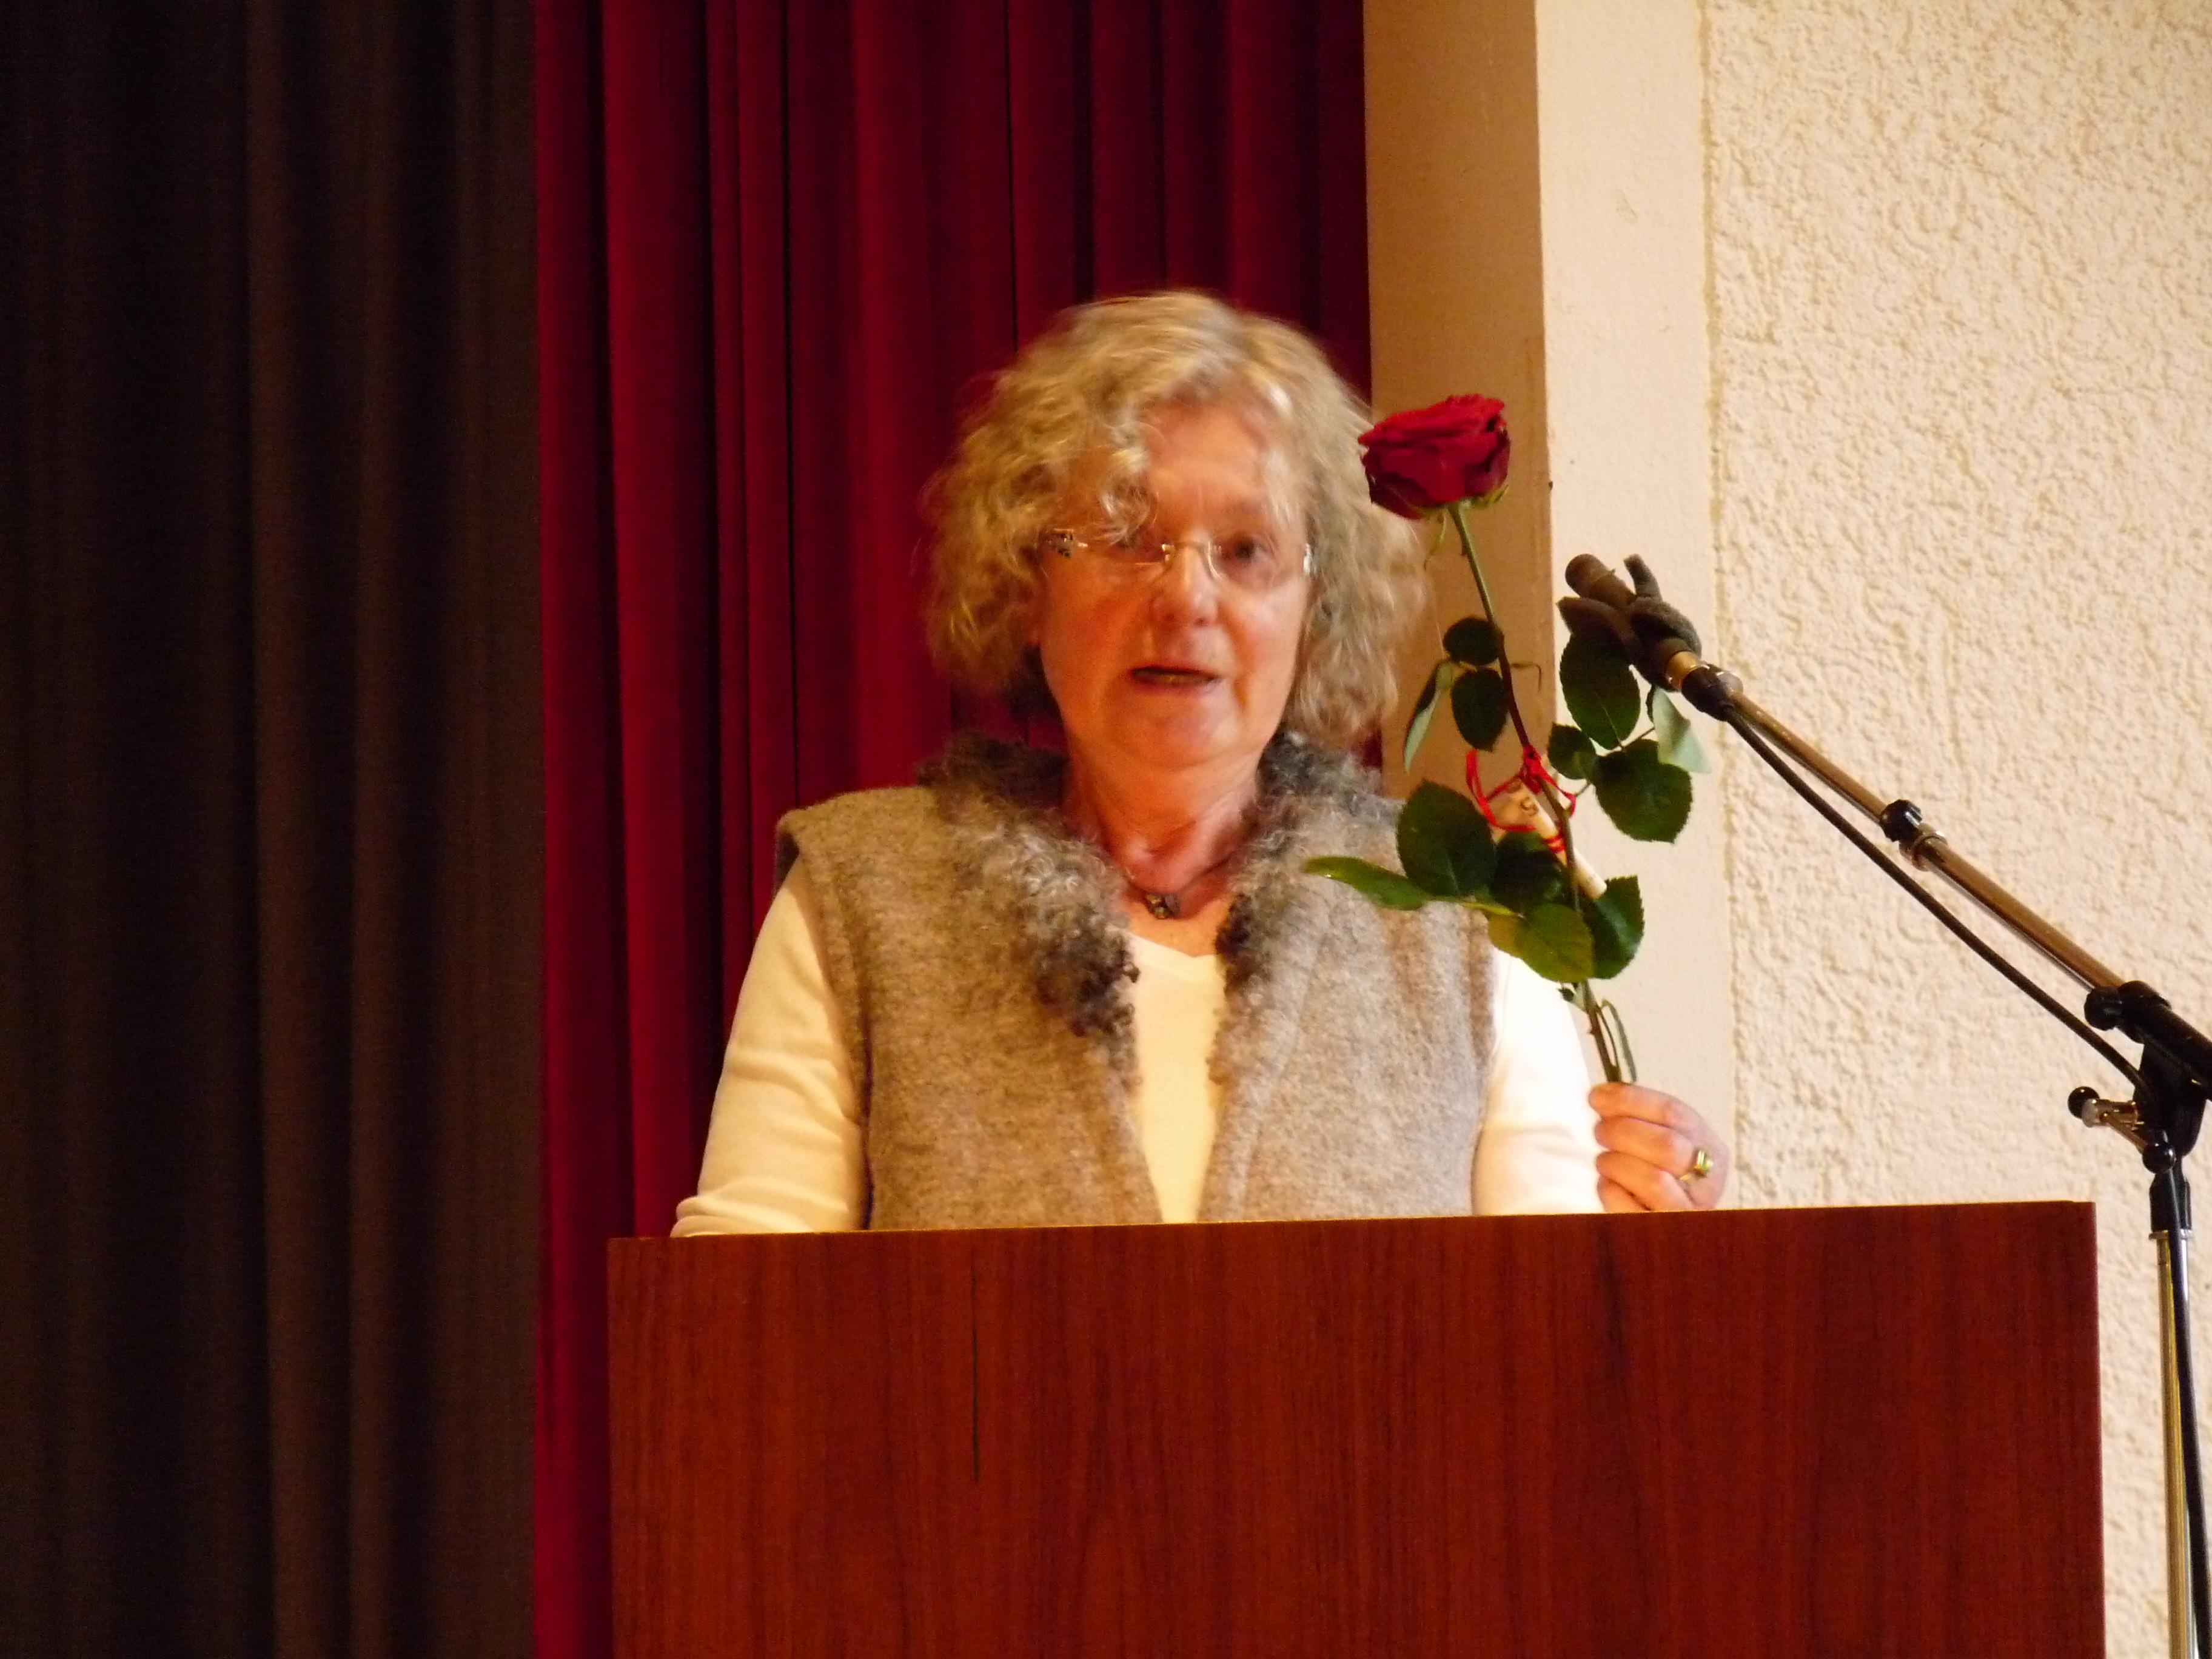 2013-Jubiläum-5-1-Gudrun Held Vorstand BEFAH